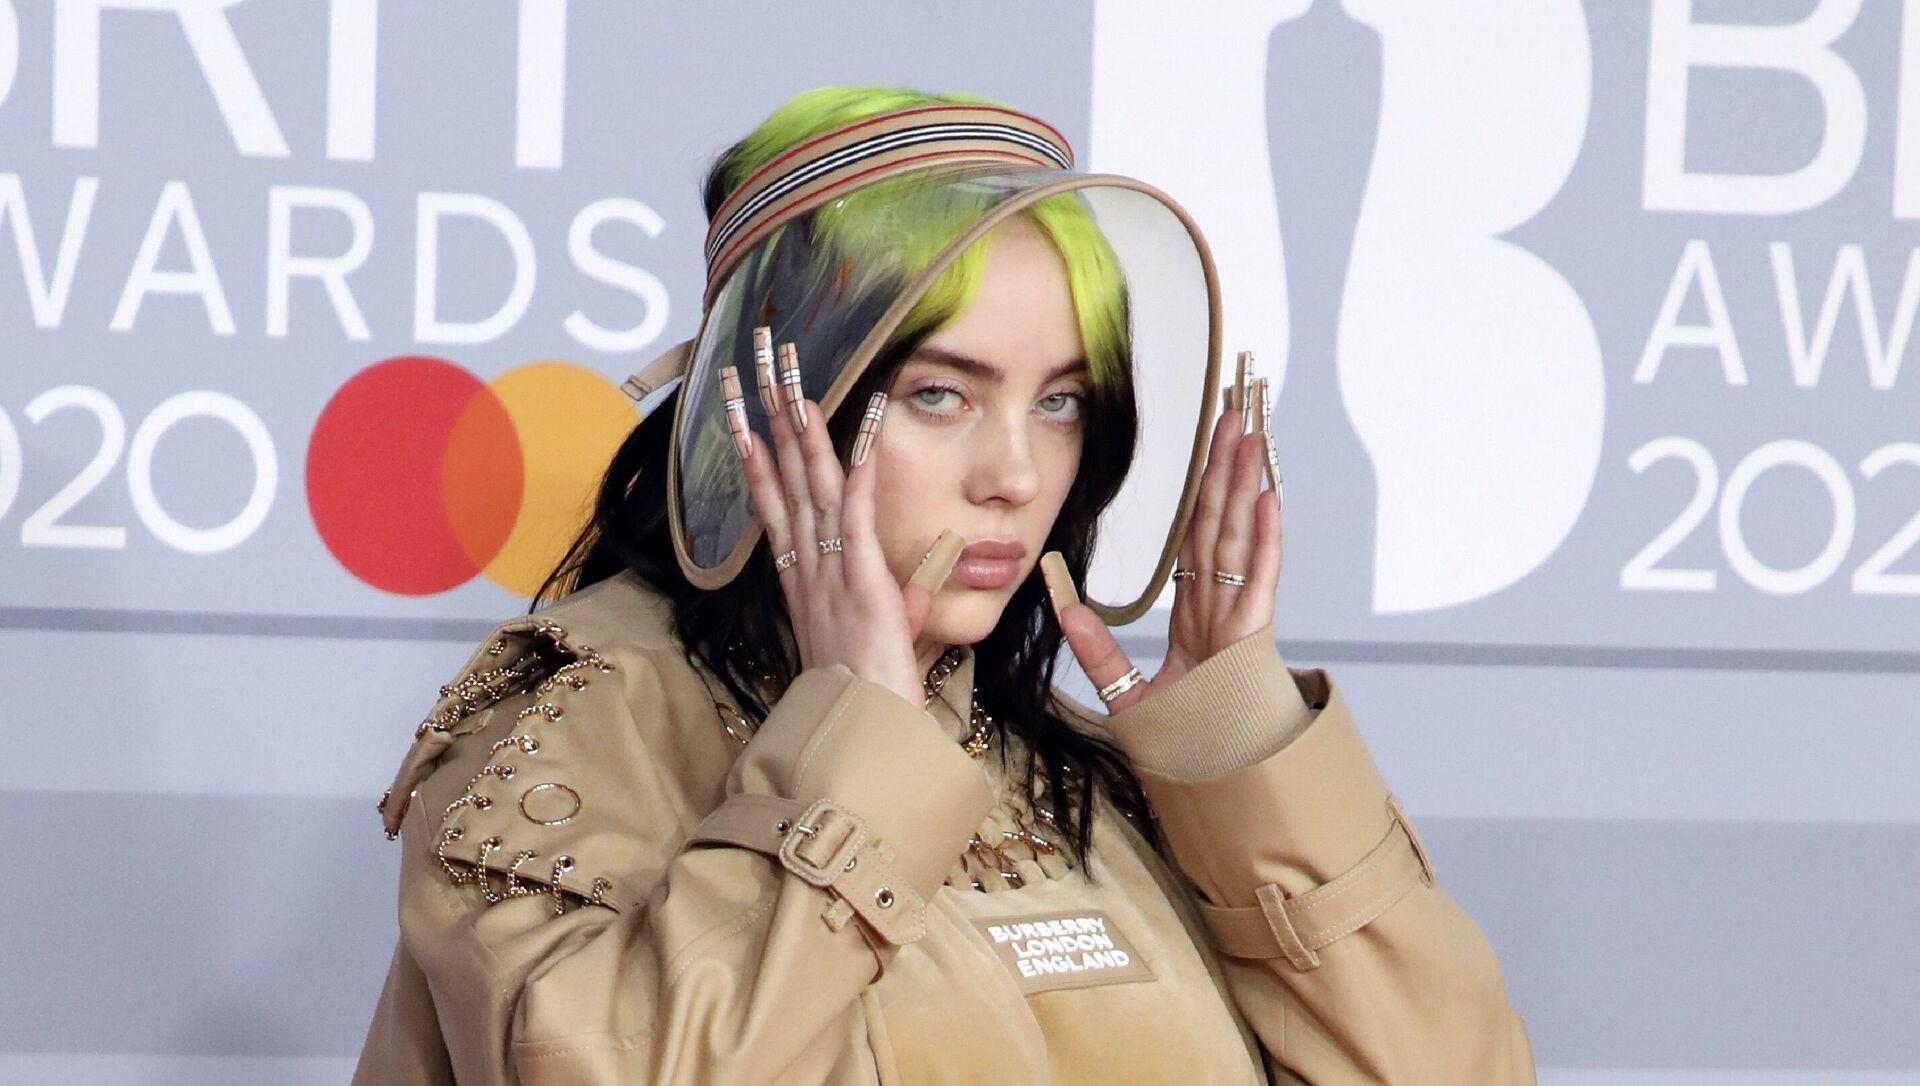 Billie Eilish poses for photographers upon arrival at Brit Awards 2020 in London, Tuesday, Feb. 18, 2020 - Sputnik International, 1920, 31.07.2021